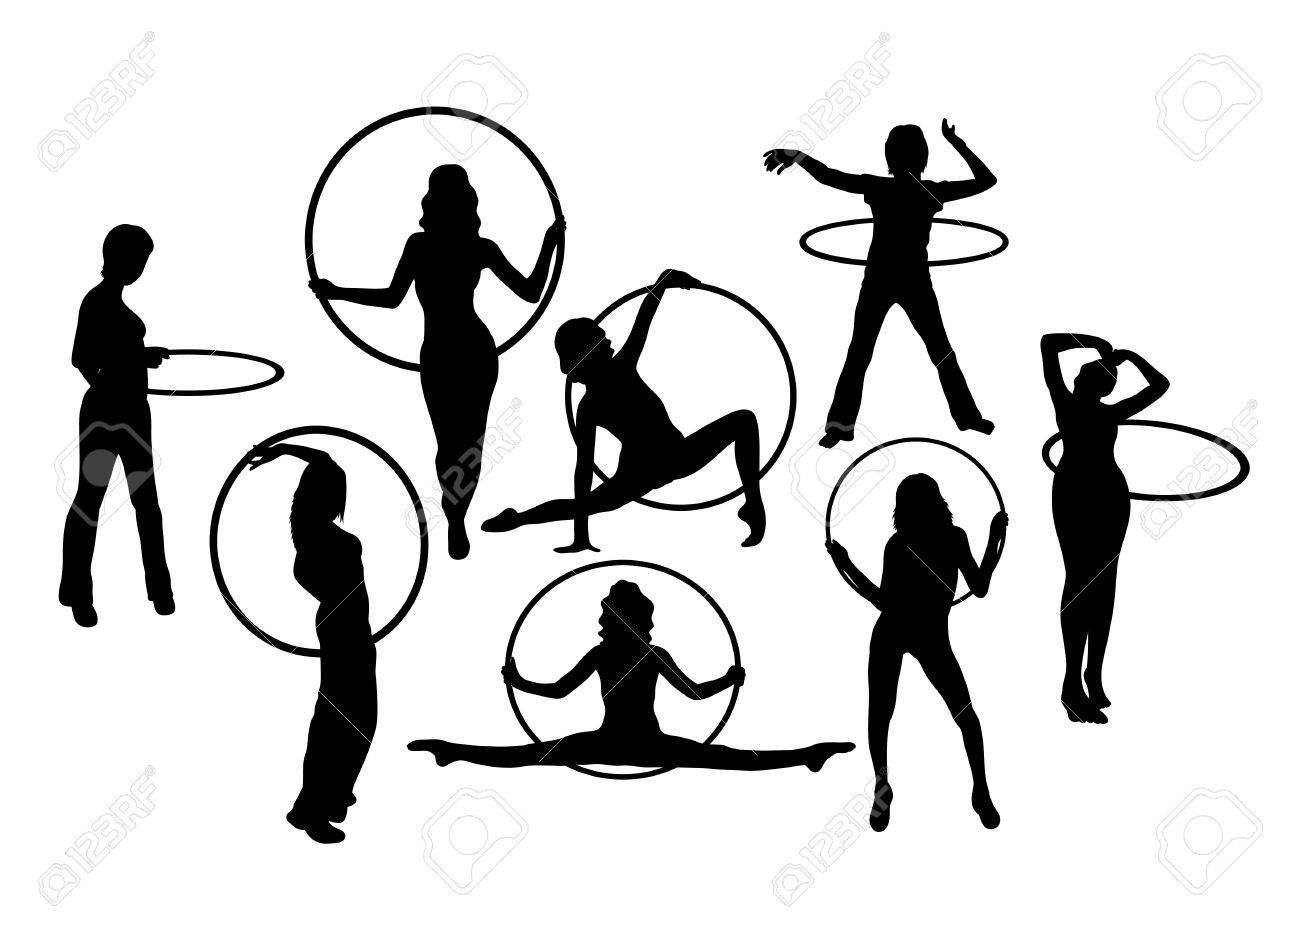 Line Art Vector Design : Hula hoop dancer activity silhouettes art vector design royalty